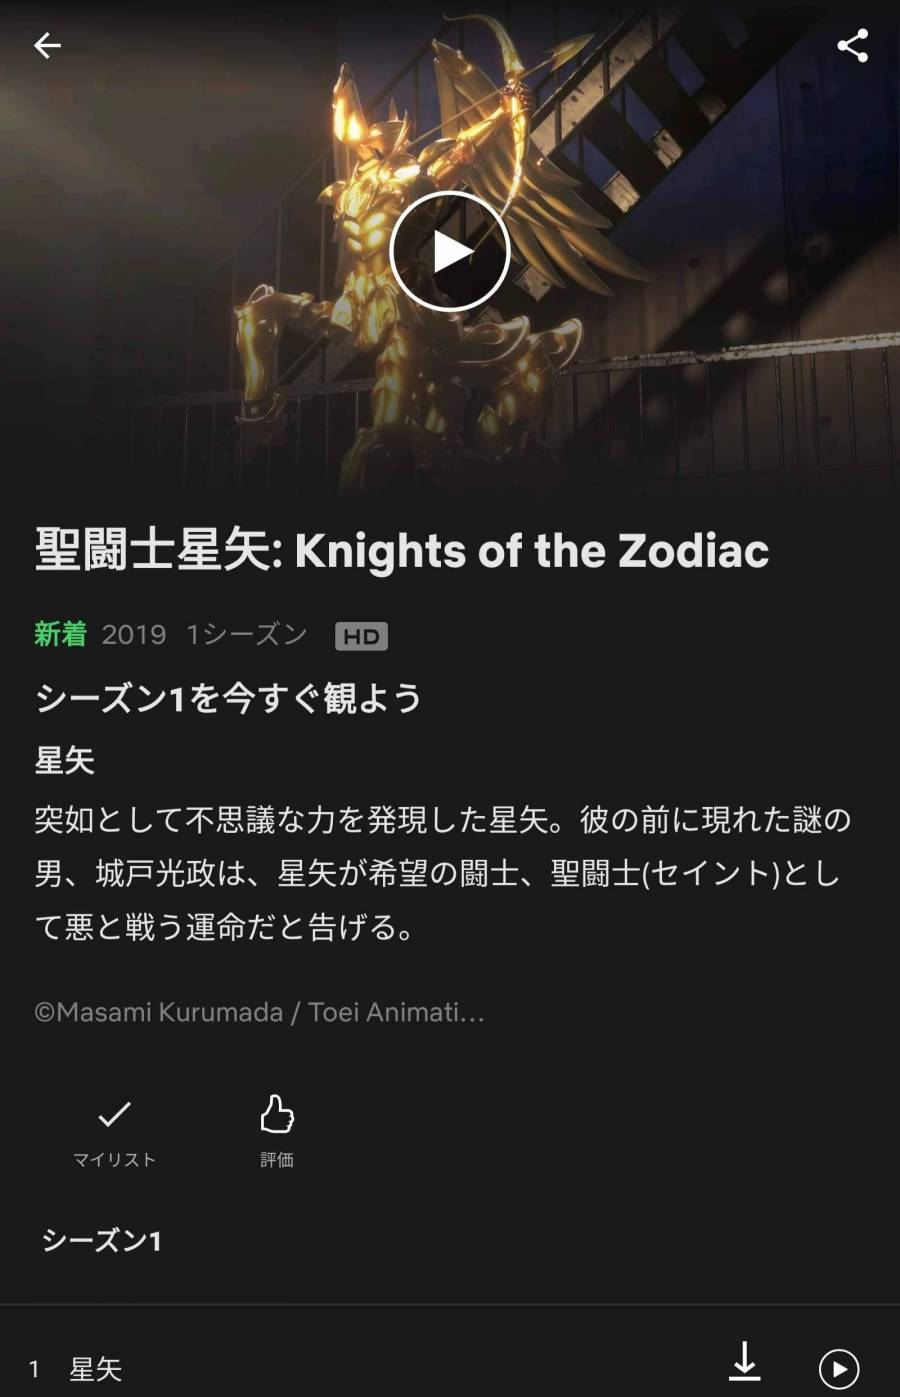 聖闘士星矢: Knights of the Zodiac作品ページ